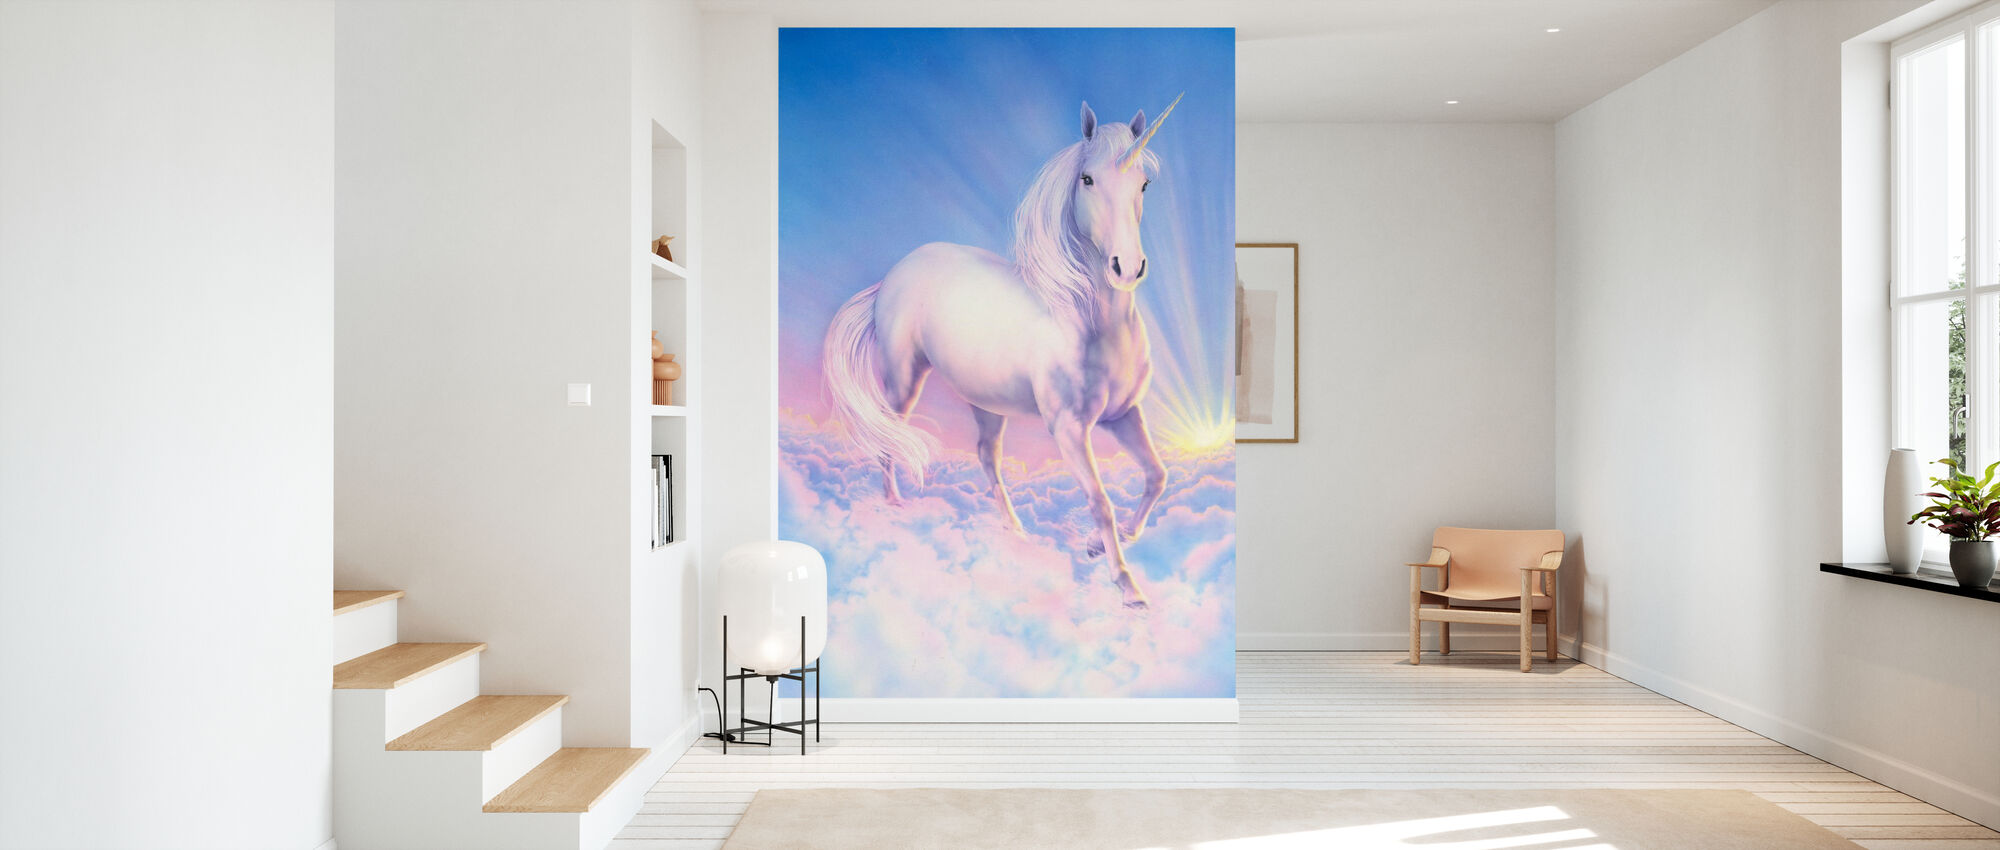 Dream Unicorn - Wallpaper - Hallway